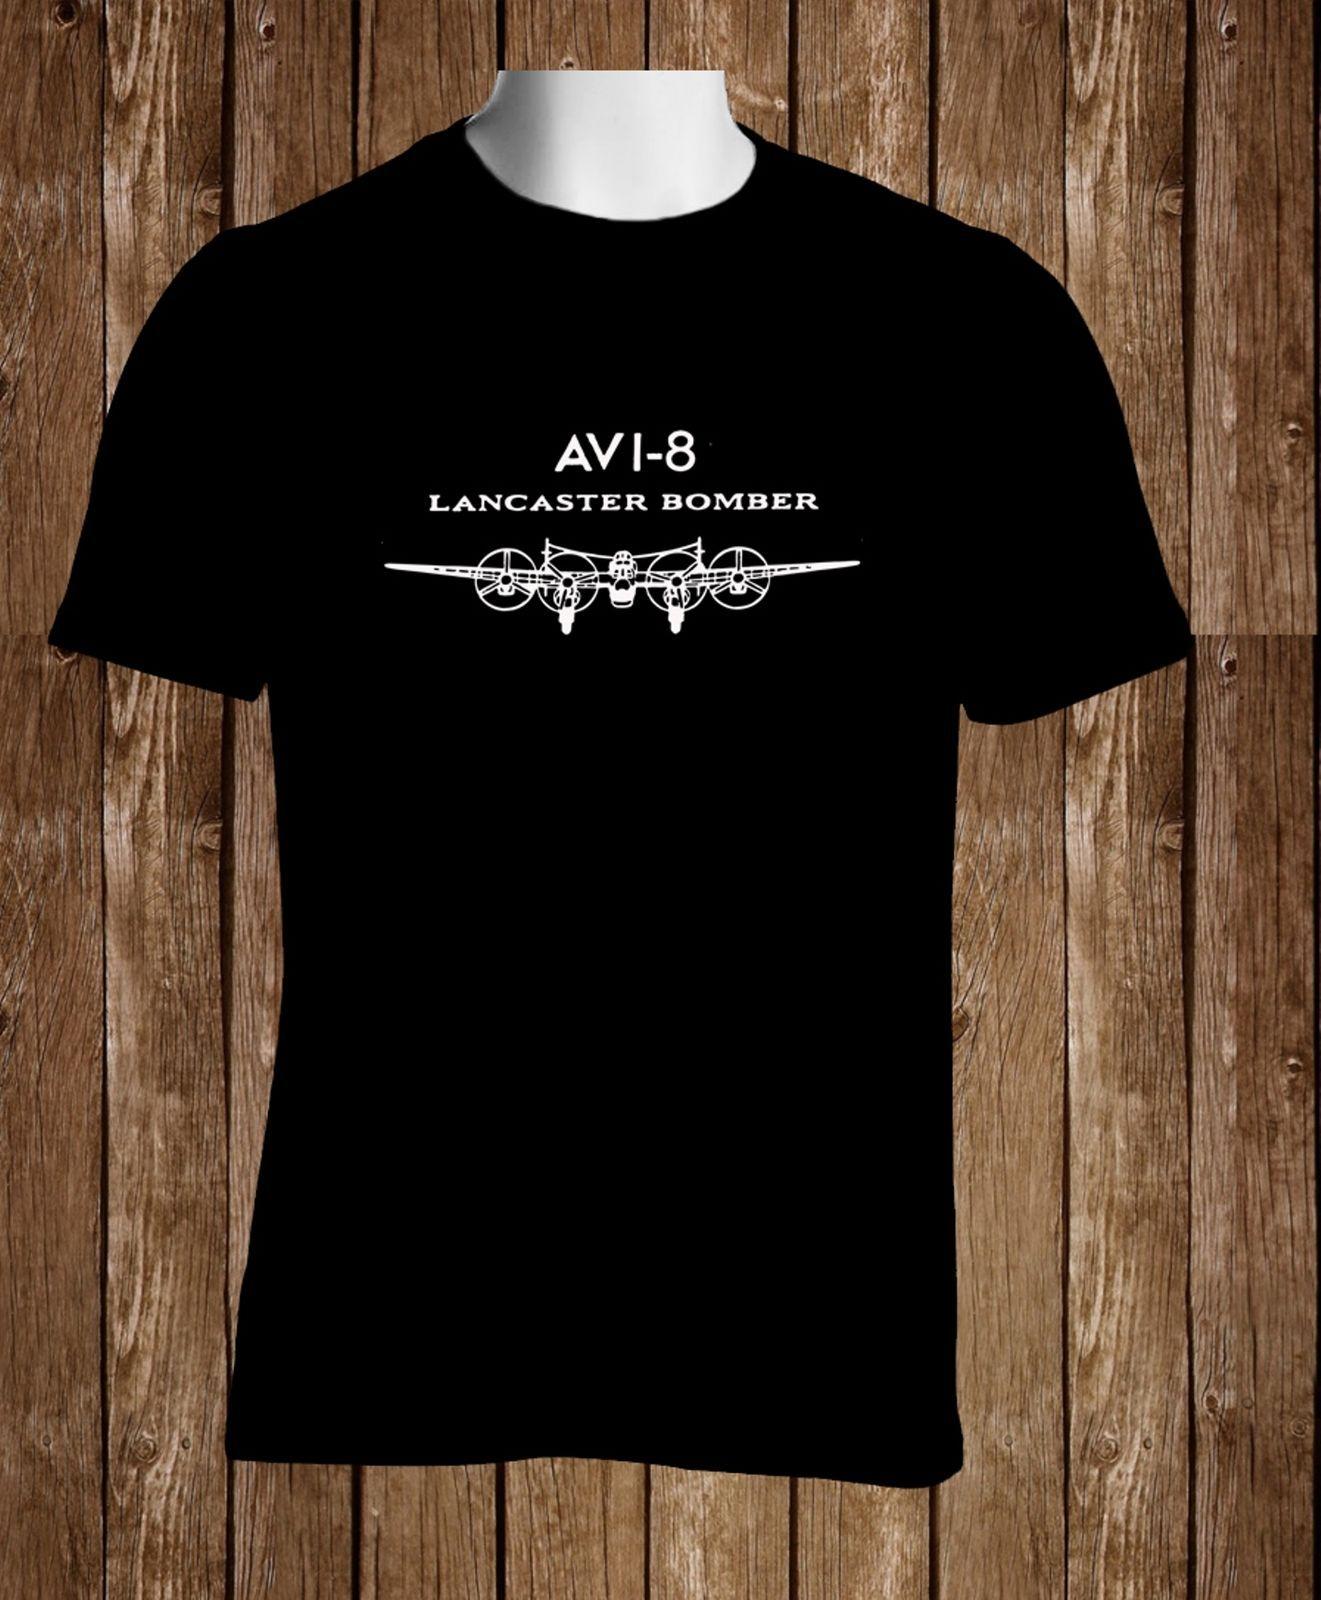 2020 Fashion Summer Style Black T-Shirt Avi 8 Lancaster Bomber Watches Men's Tshirt S To 5xl Tee Shirt